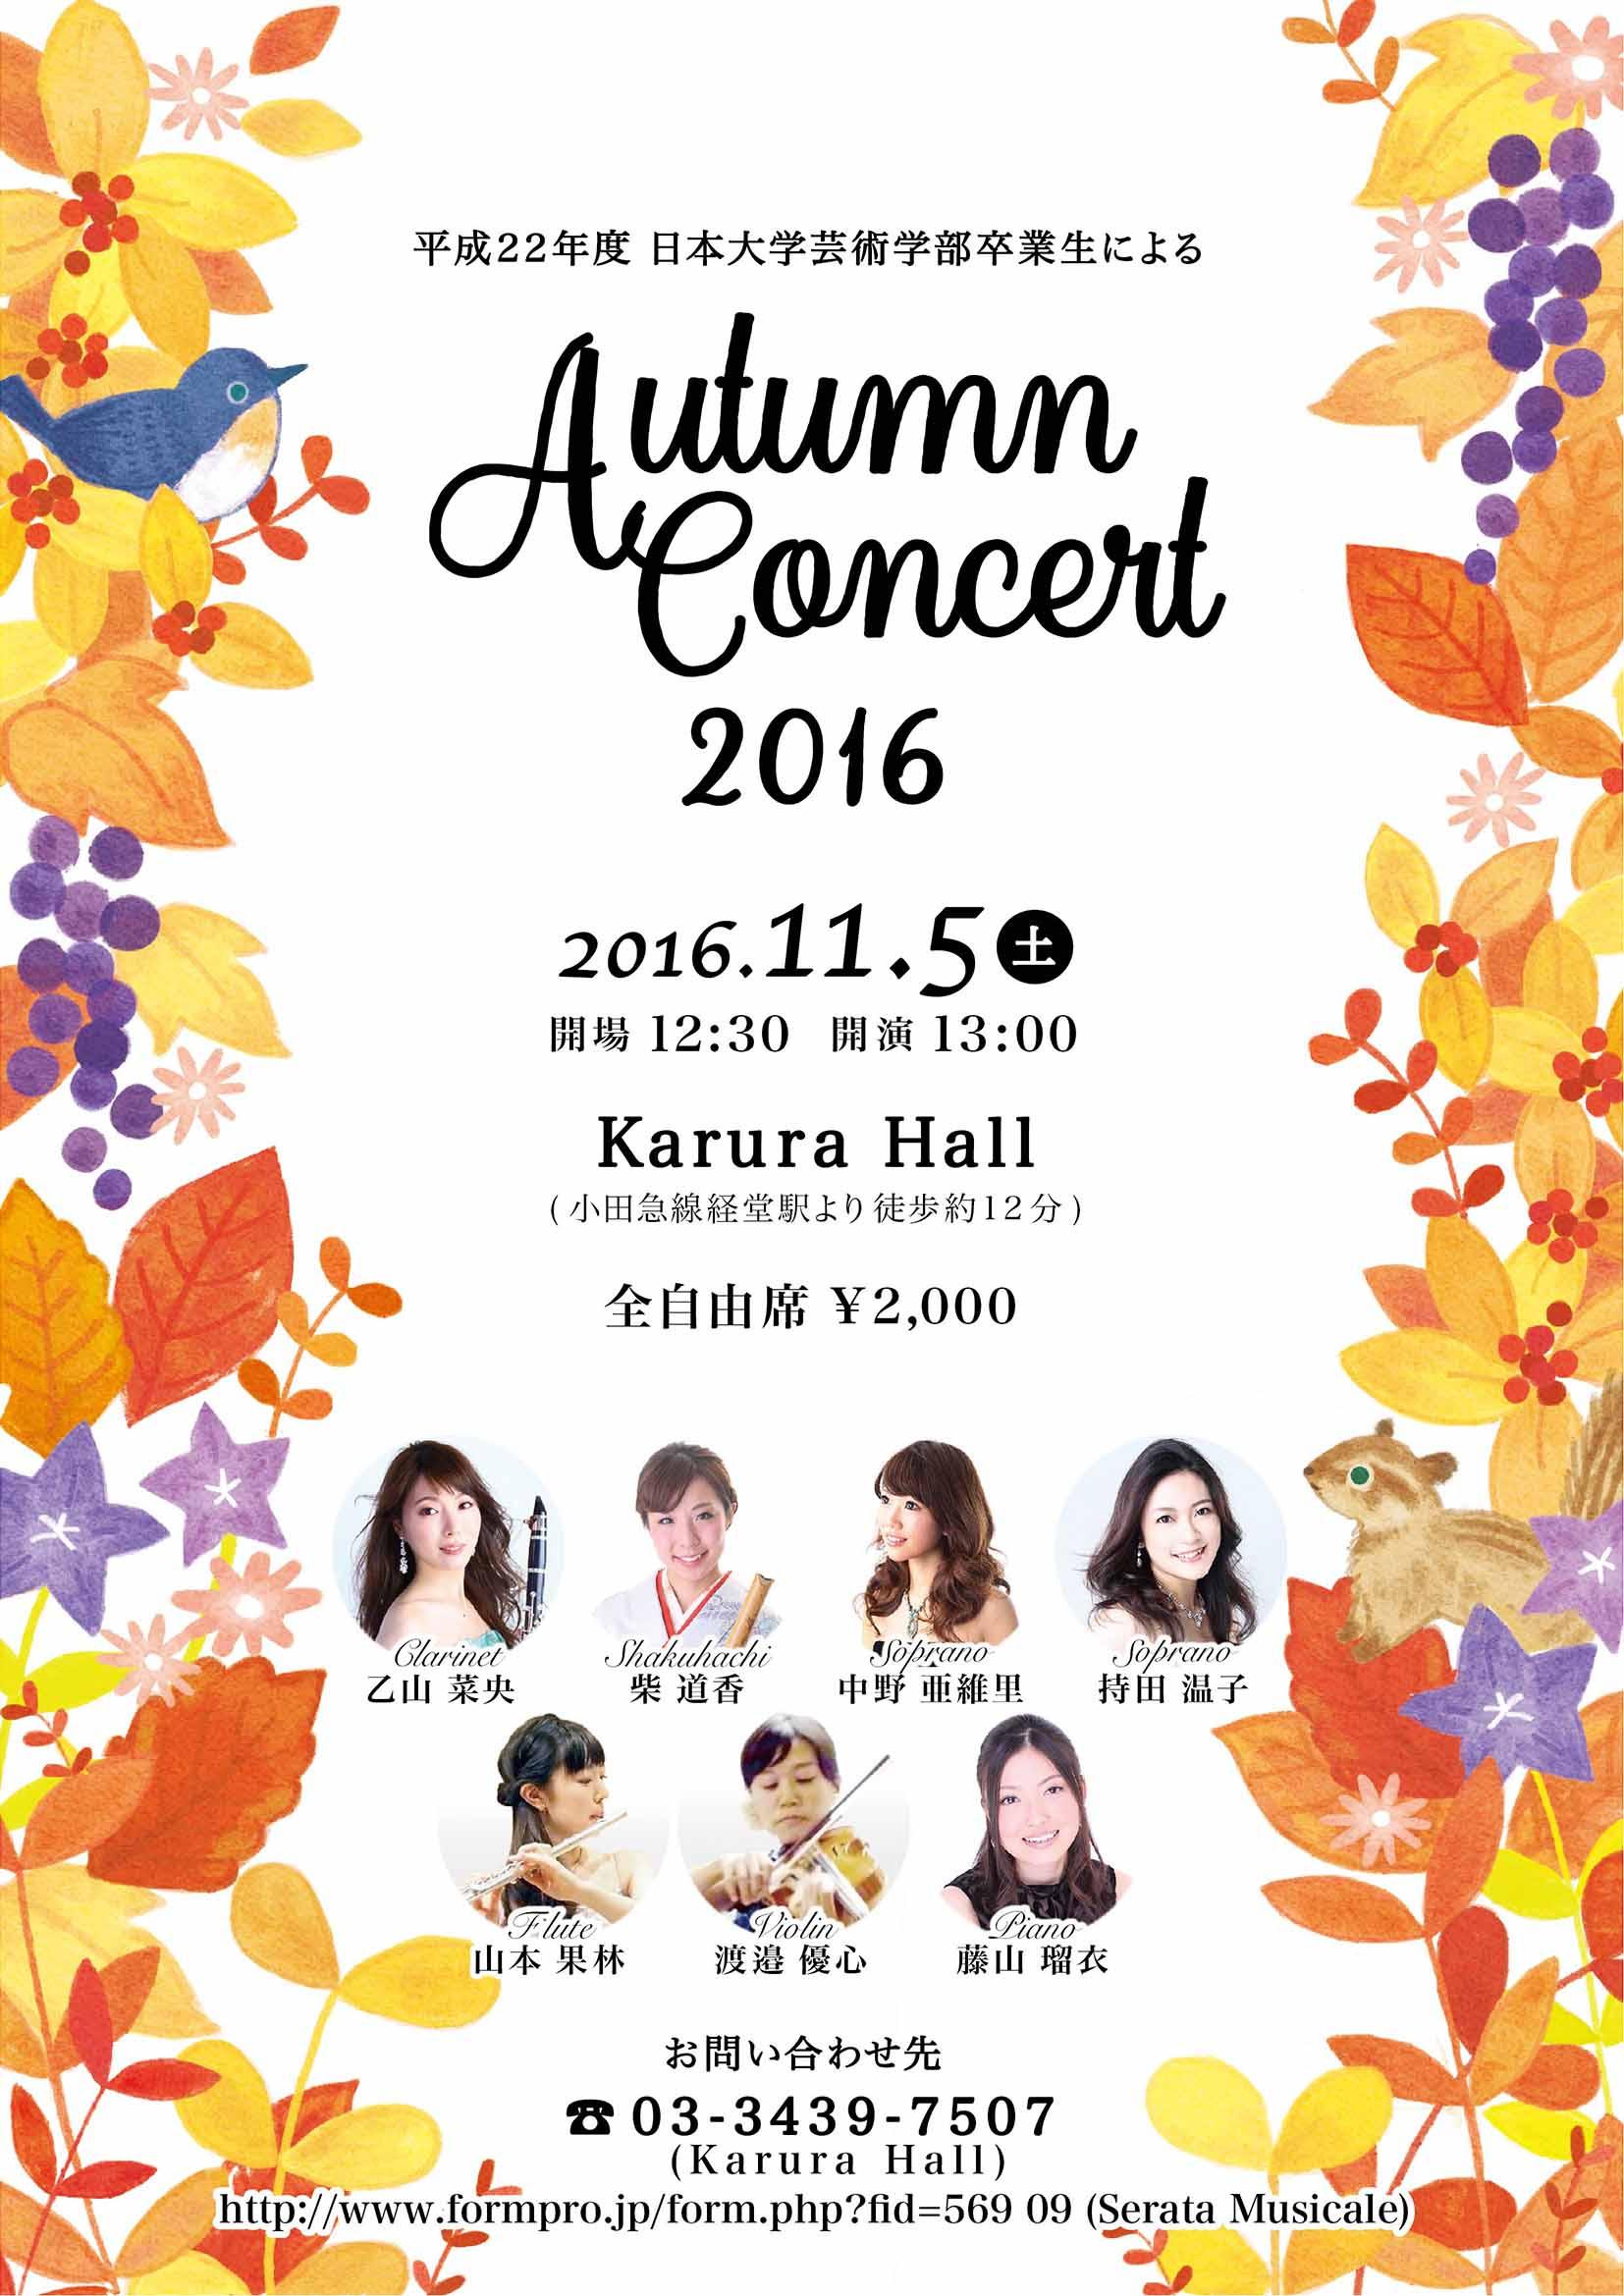 Kazuemon のぱれっと Autumn Concert ポスターデザイン